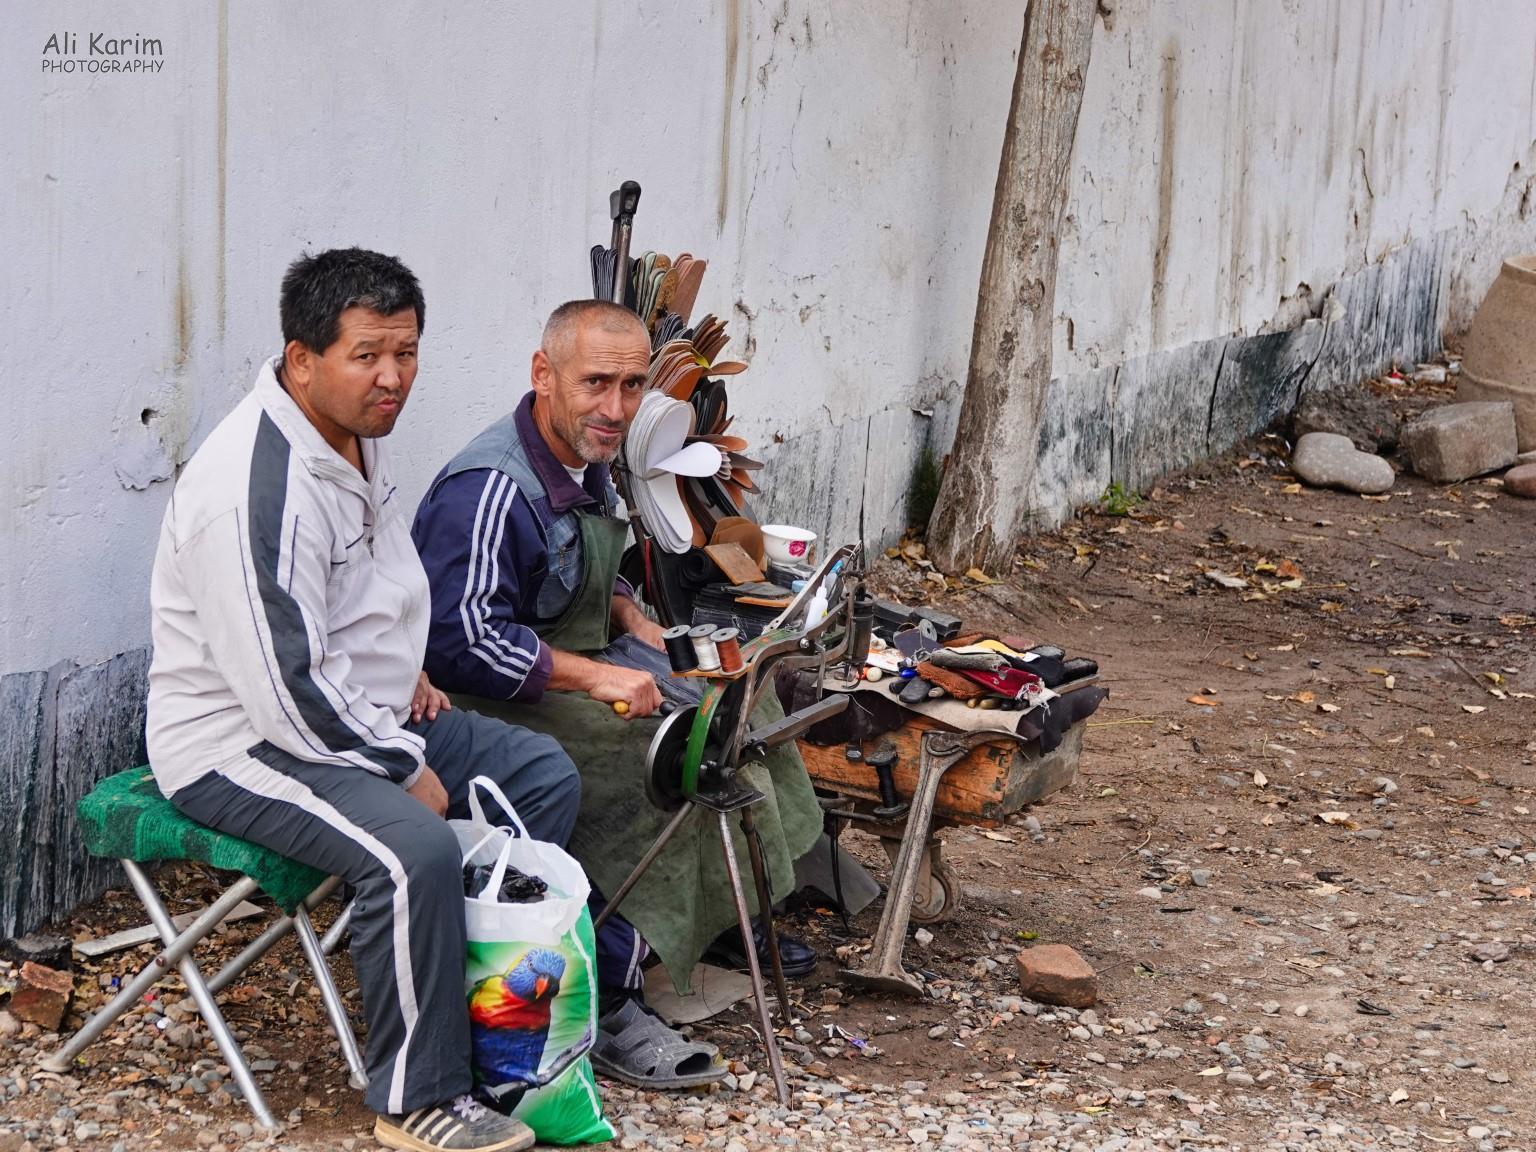 More Dushanbe, Tajikistan Small shoe repair business outside the Korvon market